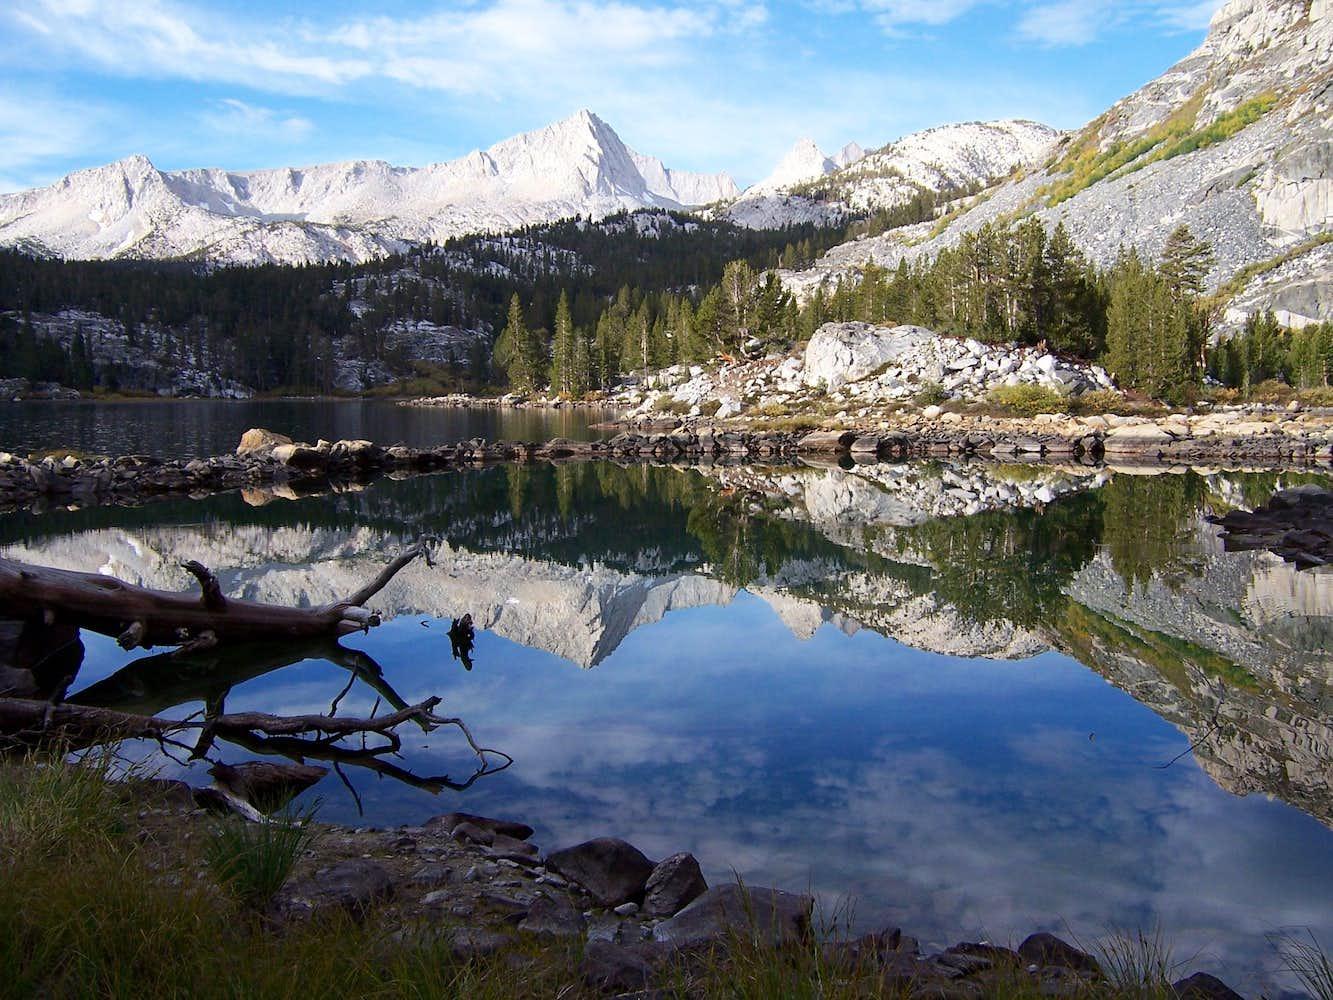 Morning reflection in Pine Lake : Photos, Diagrams & Topos ...